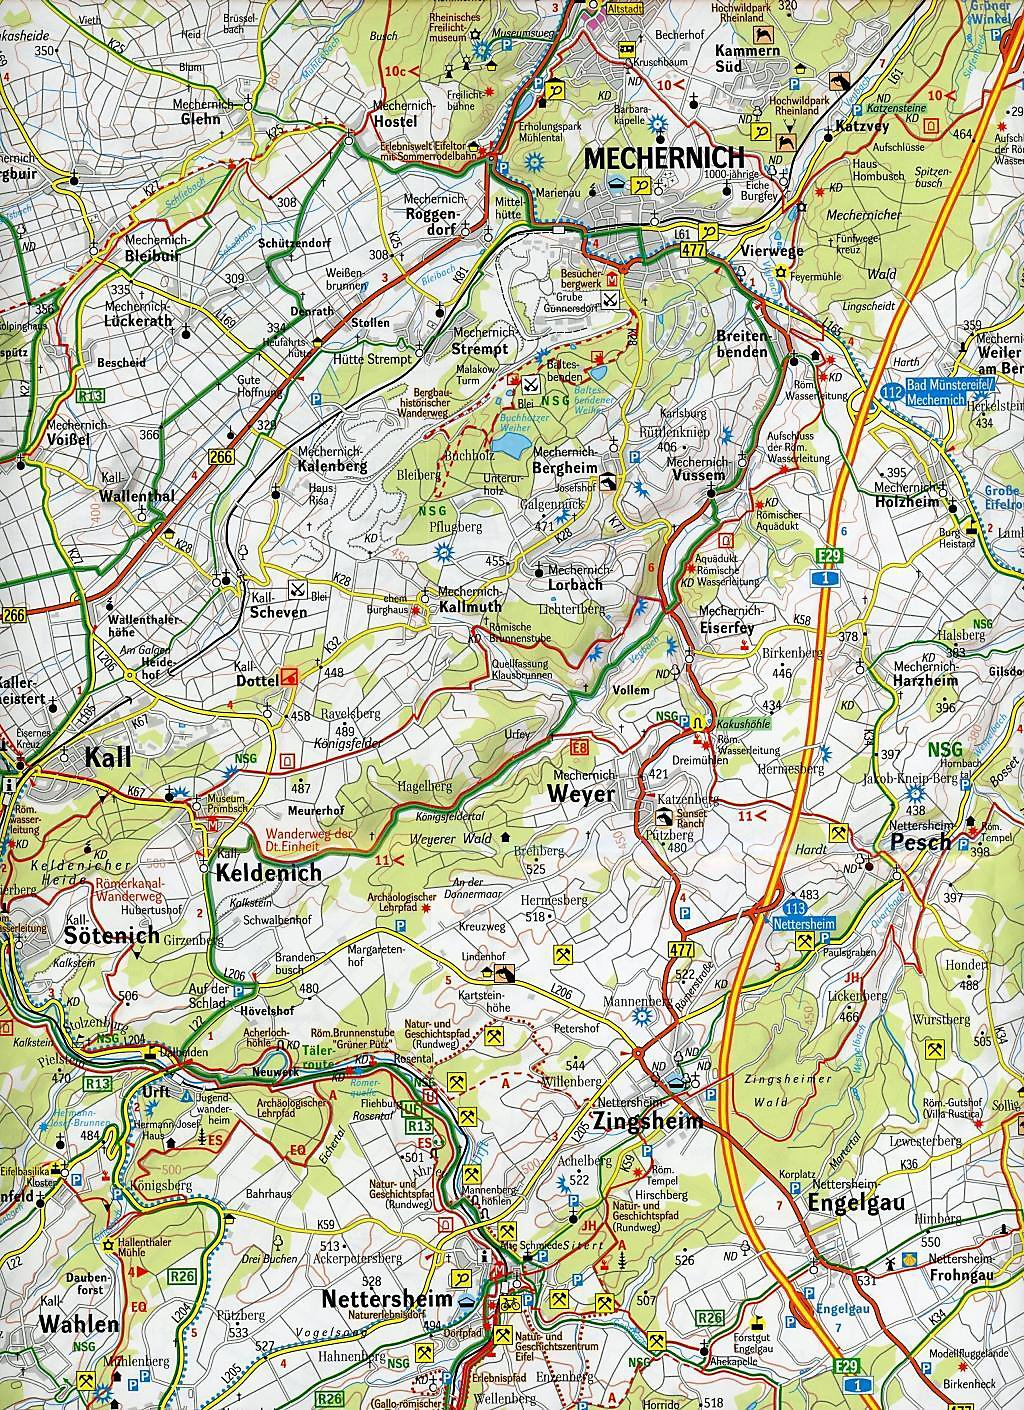 Nationalpark Eifel Karte.Geomap Karte Nationalpark Eifel Rureifel Hohes Venn Buch Kaufen